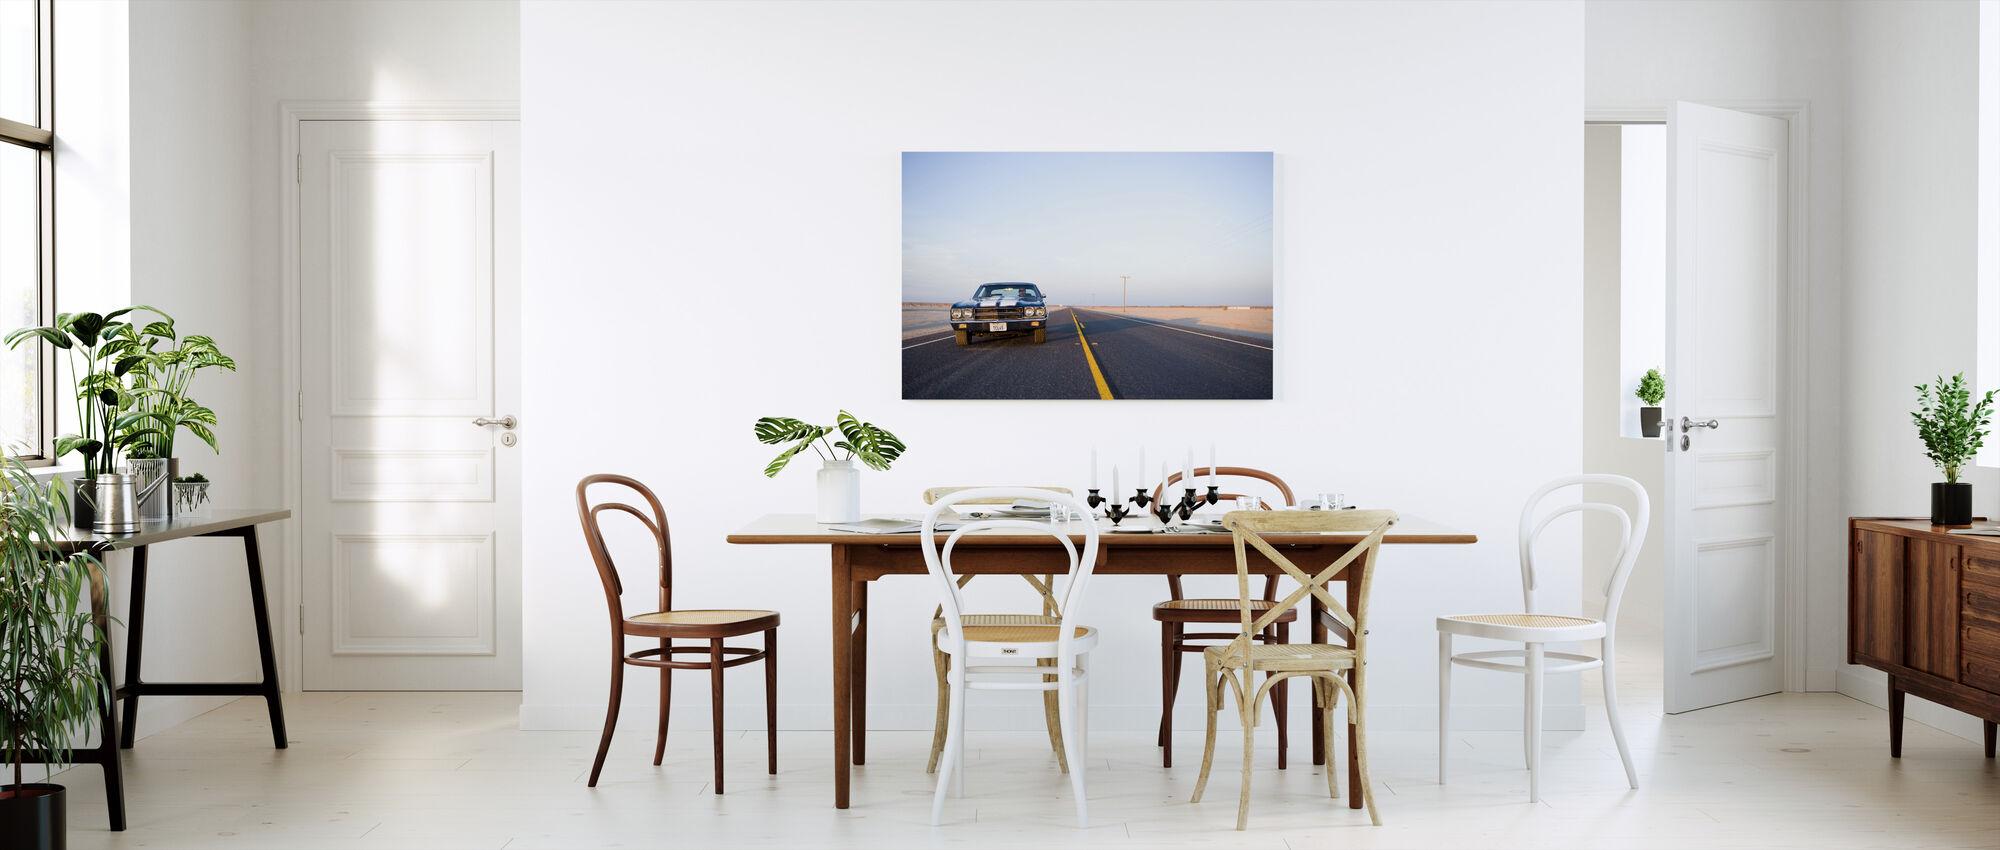 Drivin on 9 - Canvas print - Kitchen